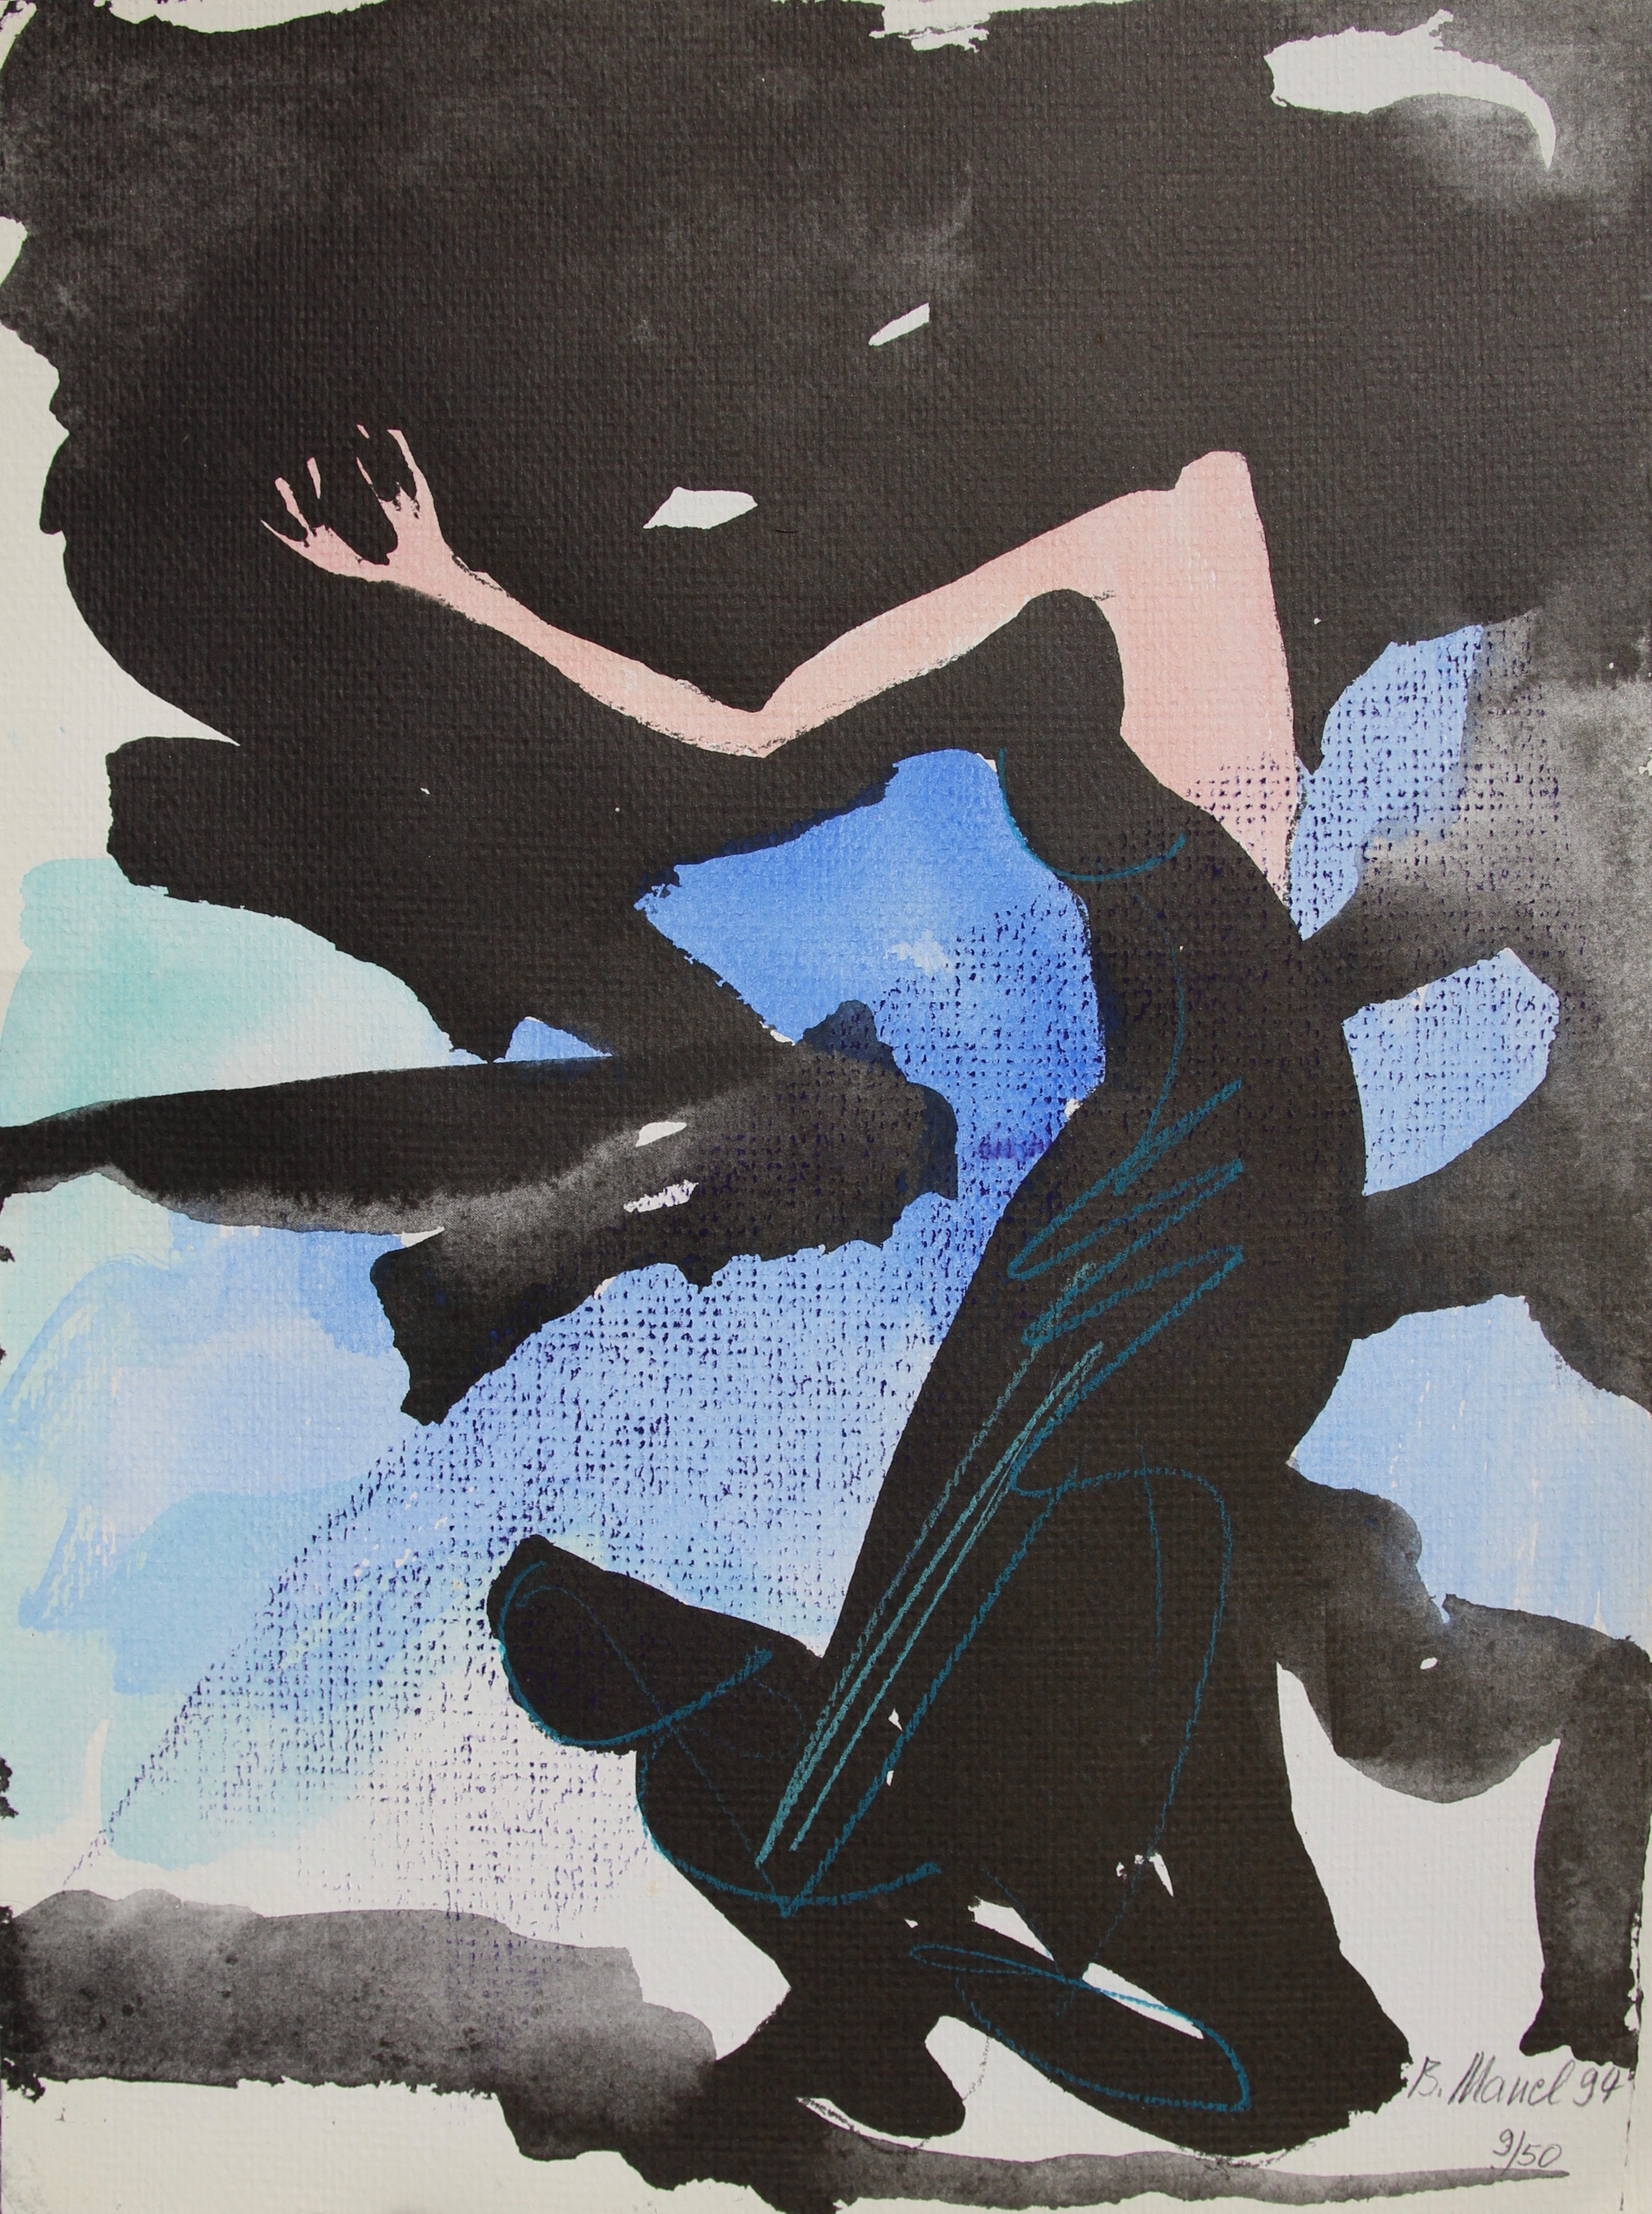 Jahr: 1994 Größe: 27 x 37 cm Auflage: 9/50 sig. Preis je Blatt: 120€ Preisje Mappe: 1000€